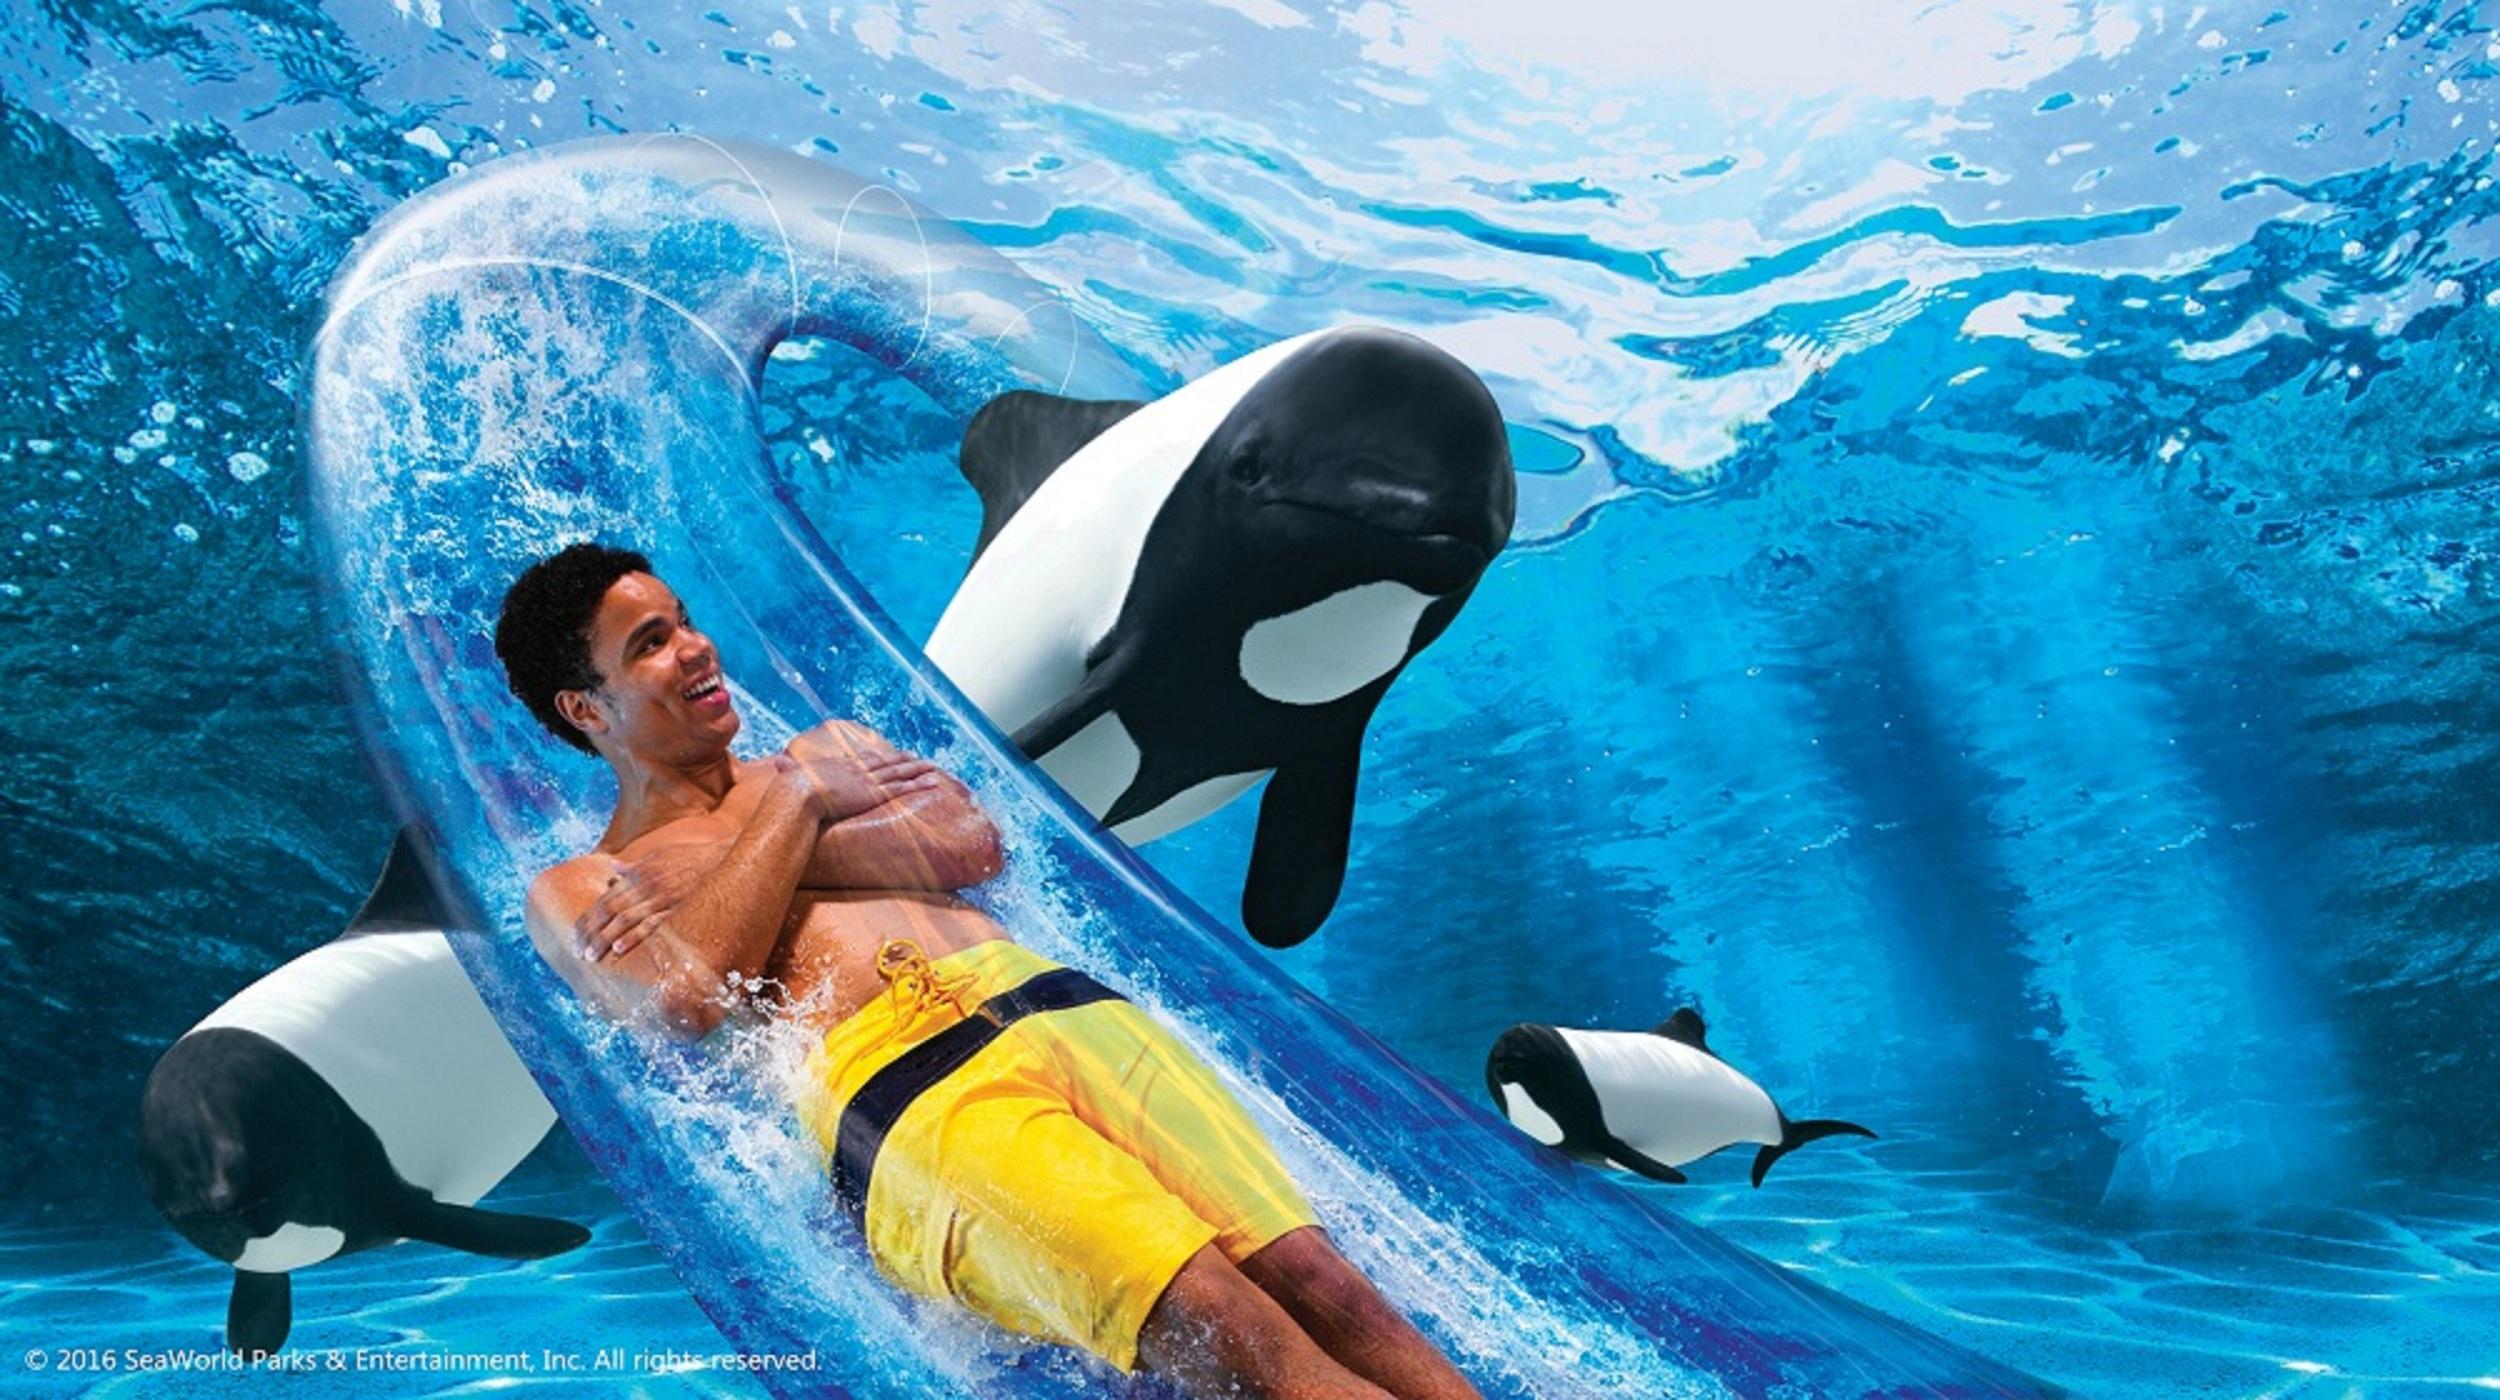 Orlando Attraction Tickets (SeaWorld, Aquatica Water Park, Tampa Busch Gardens & Tampa Adventure)